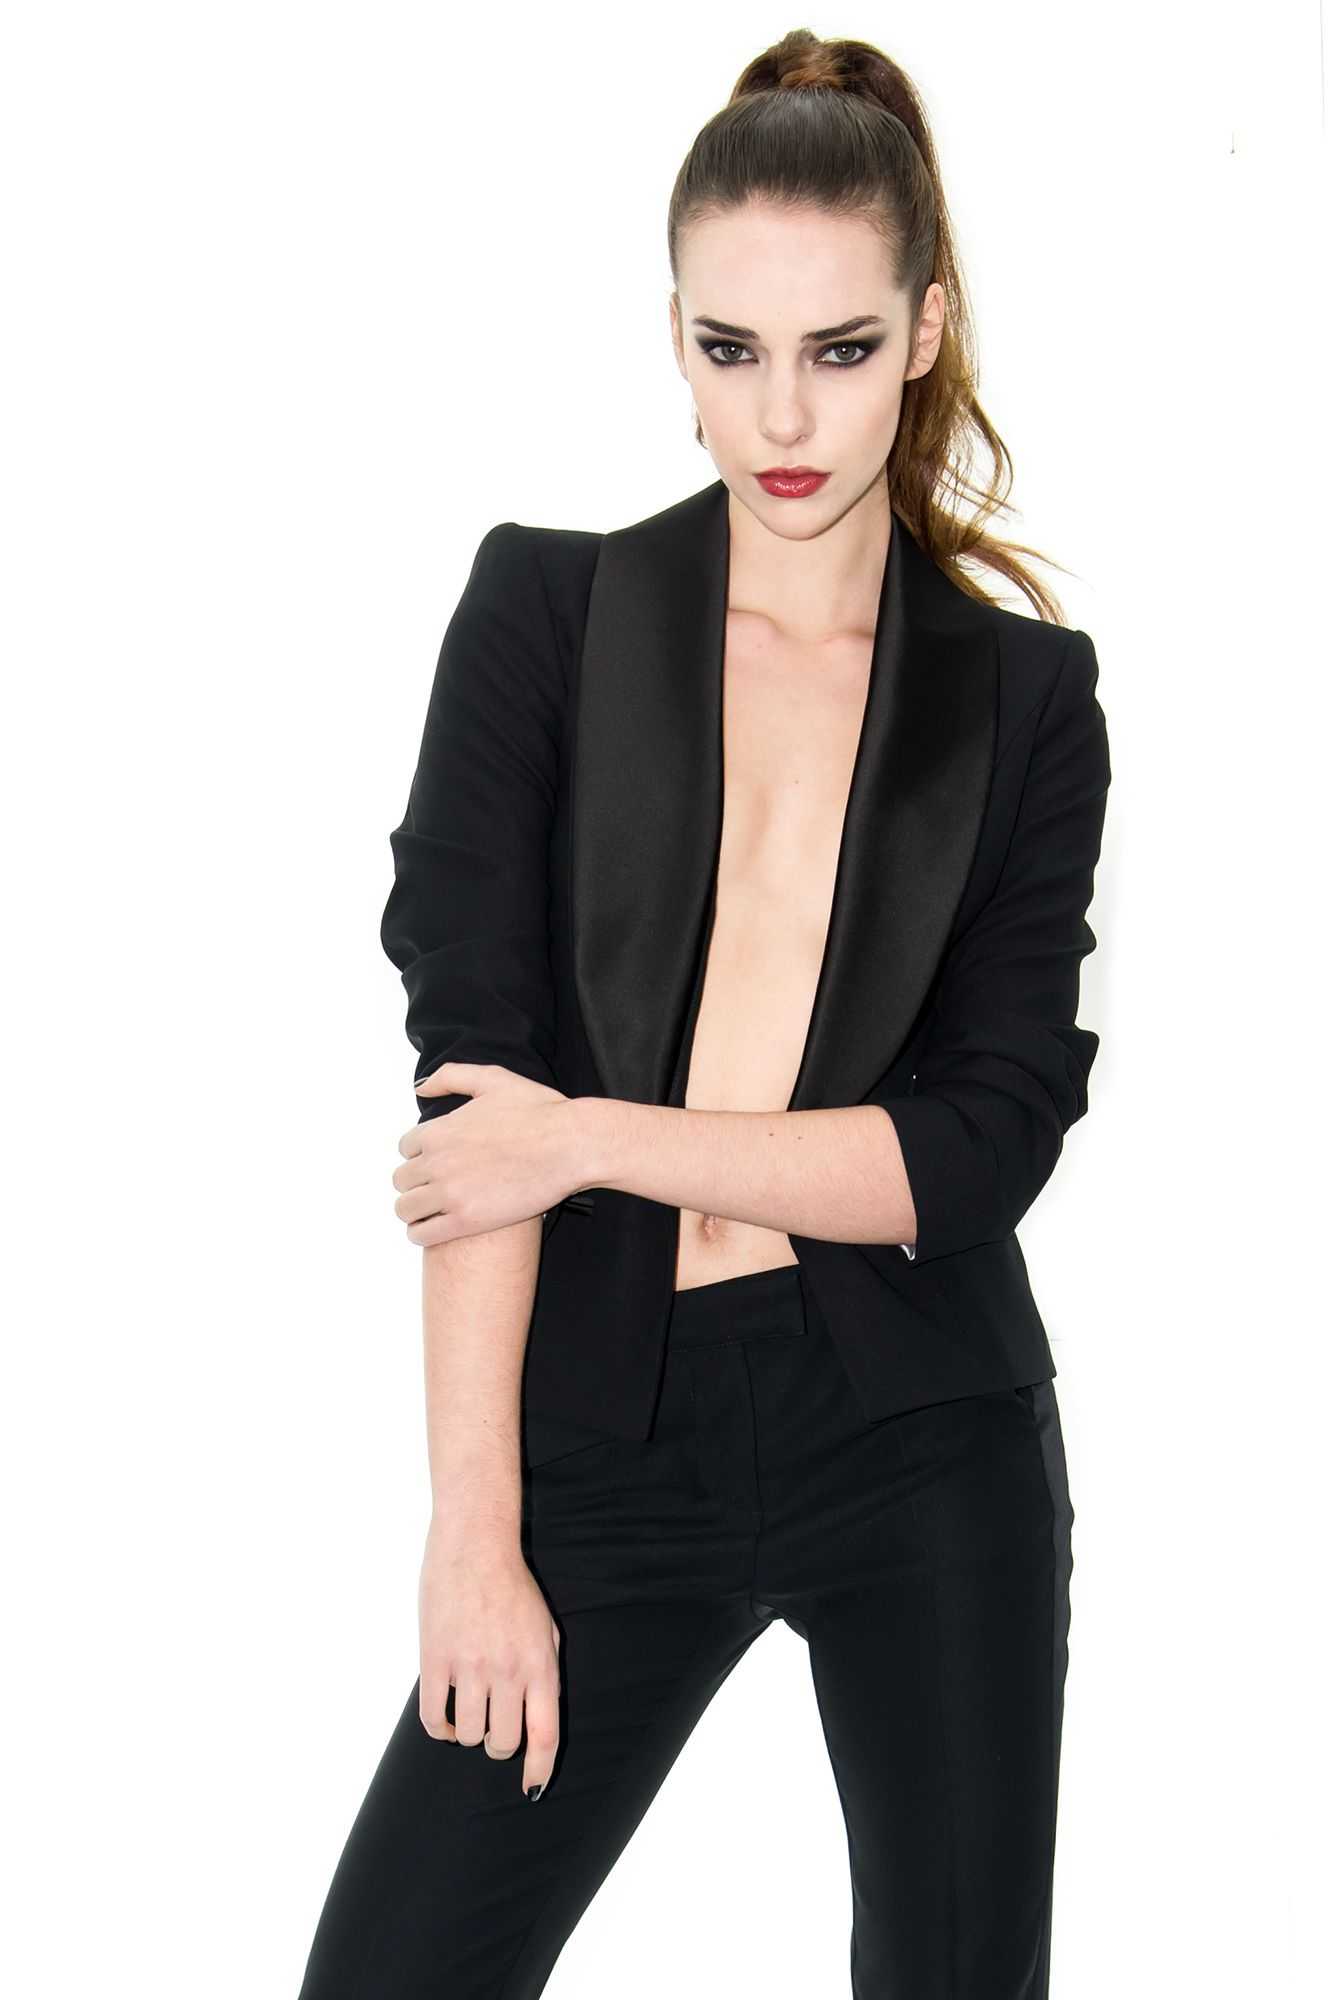 veste smoking femme veste satin noir veste courte stefanie renoma stefanie renoma dresses. Black Bedroom Furniture Sets. Home Design Ideas